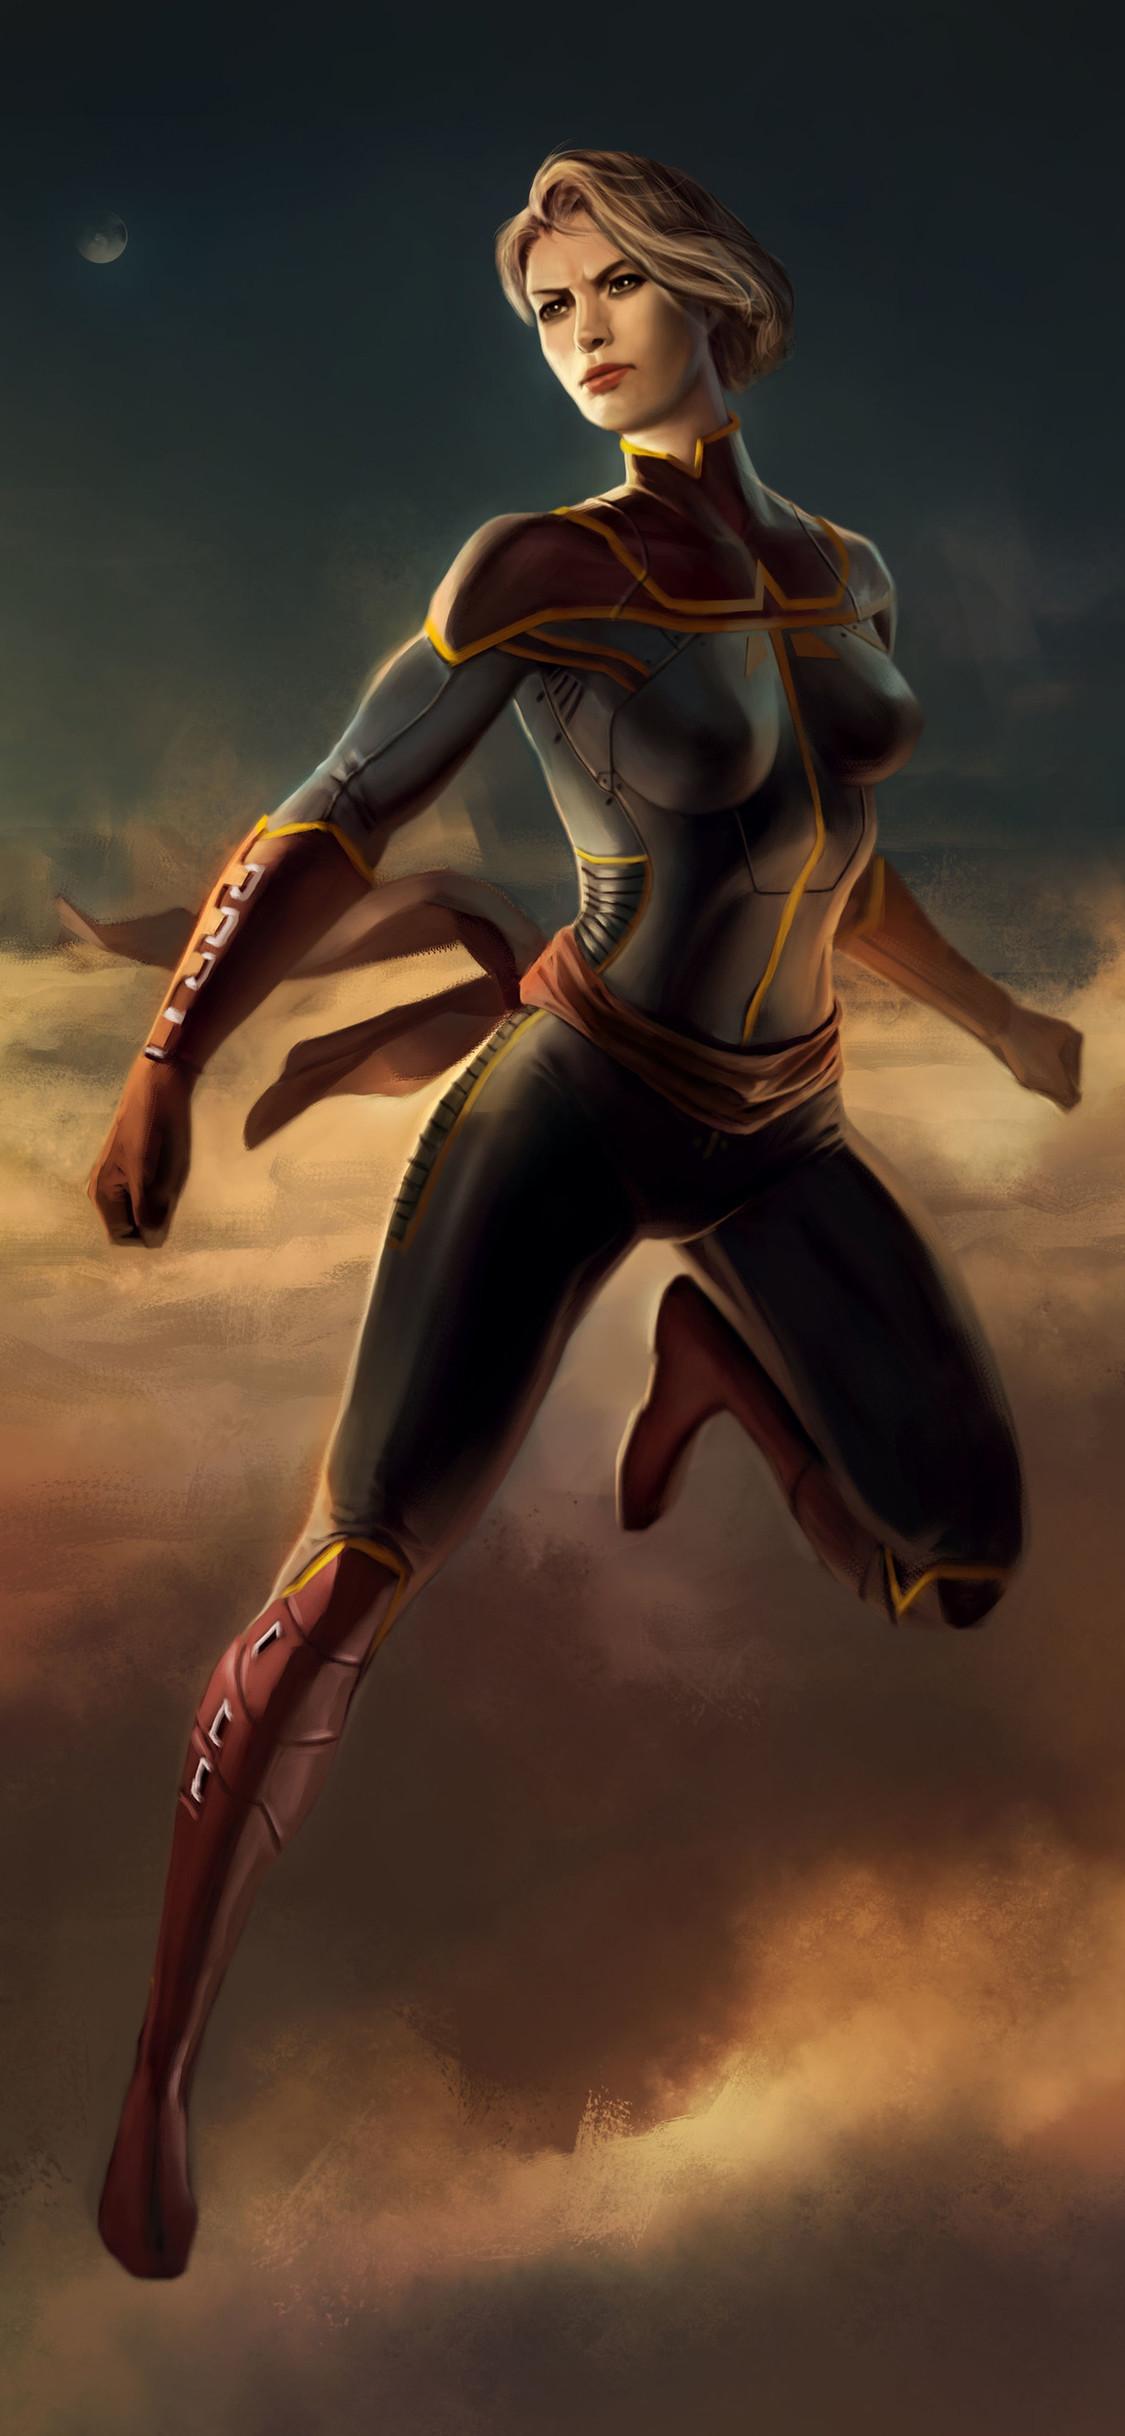 Wallpaper Marvel Hydra Coupã© Front - Captain Marvel Comic Art , HD Wallpaper & Backgrounds